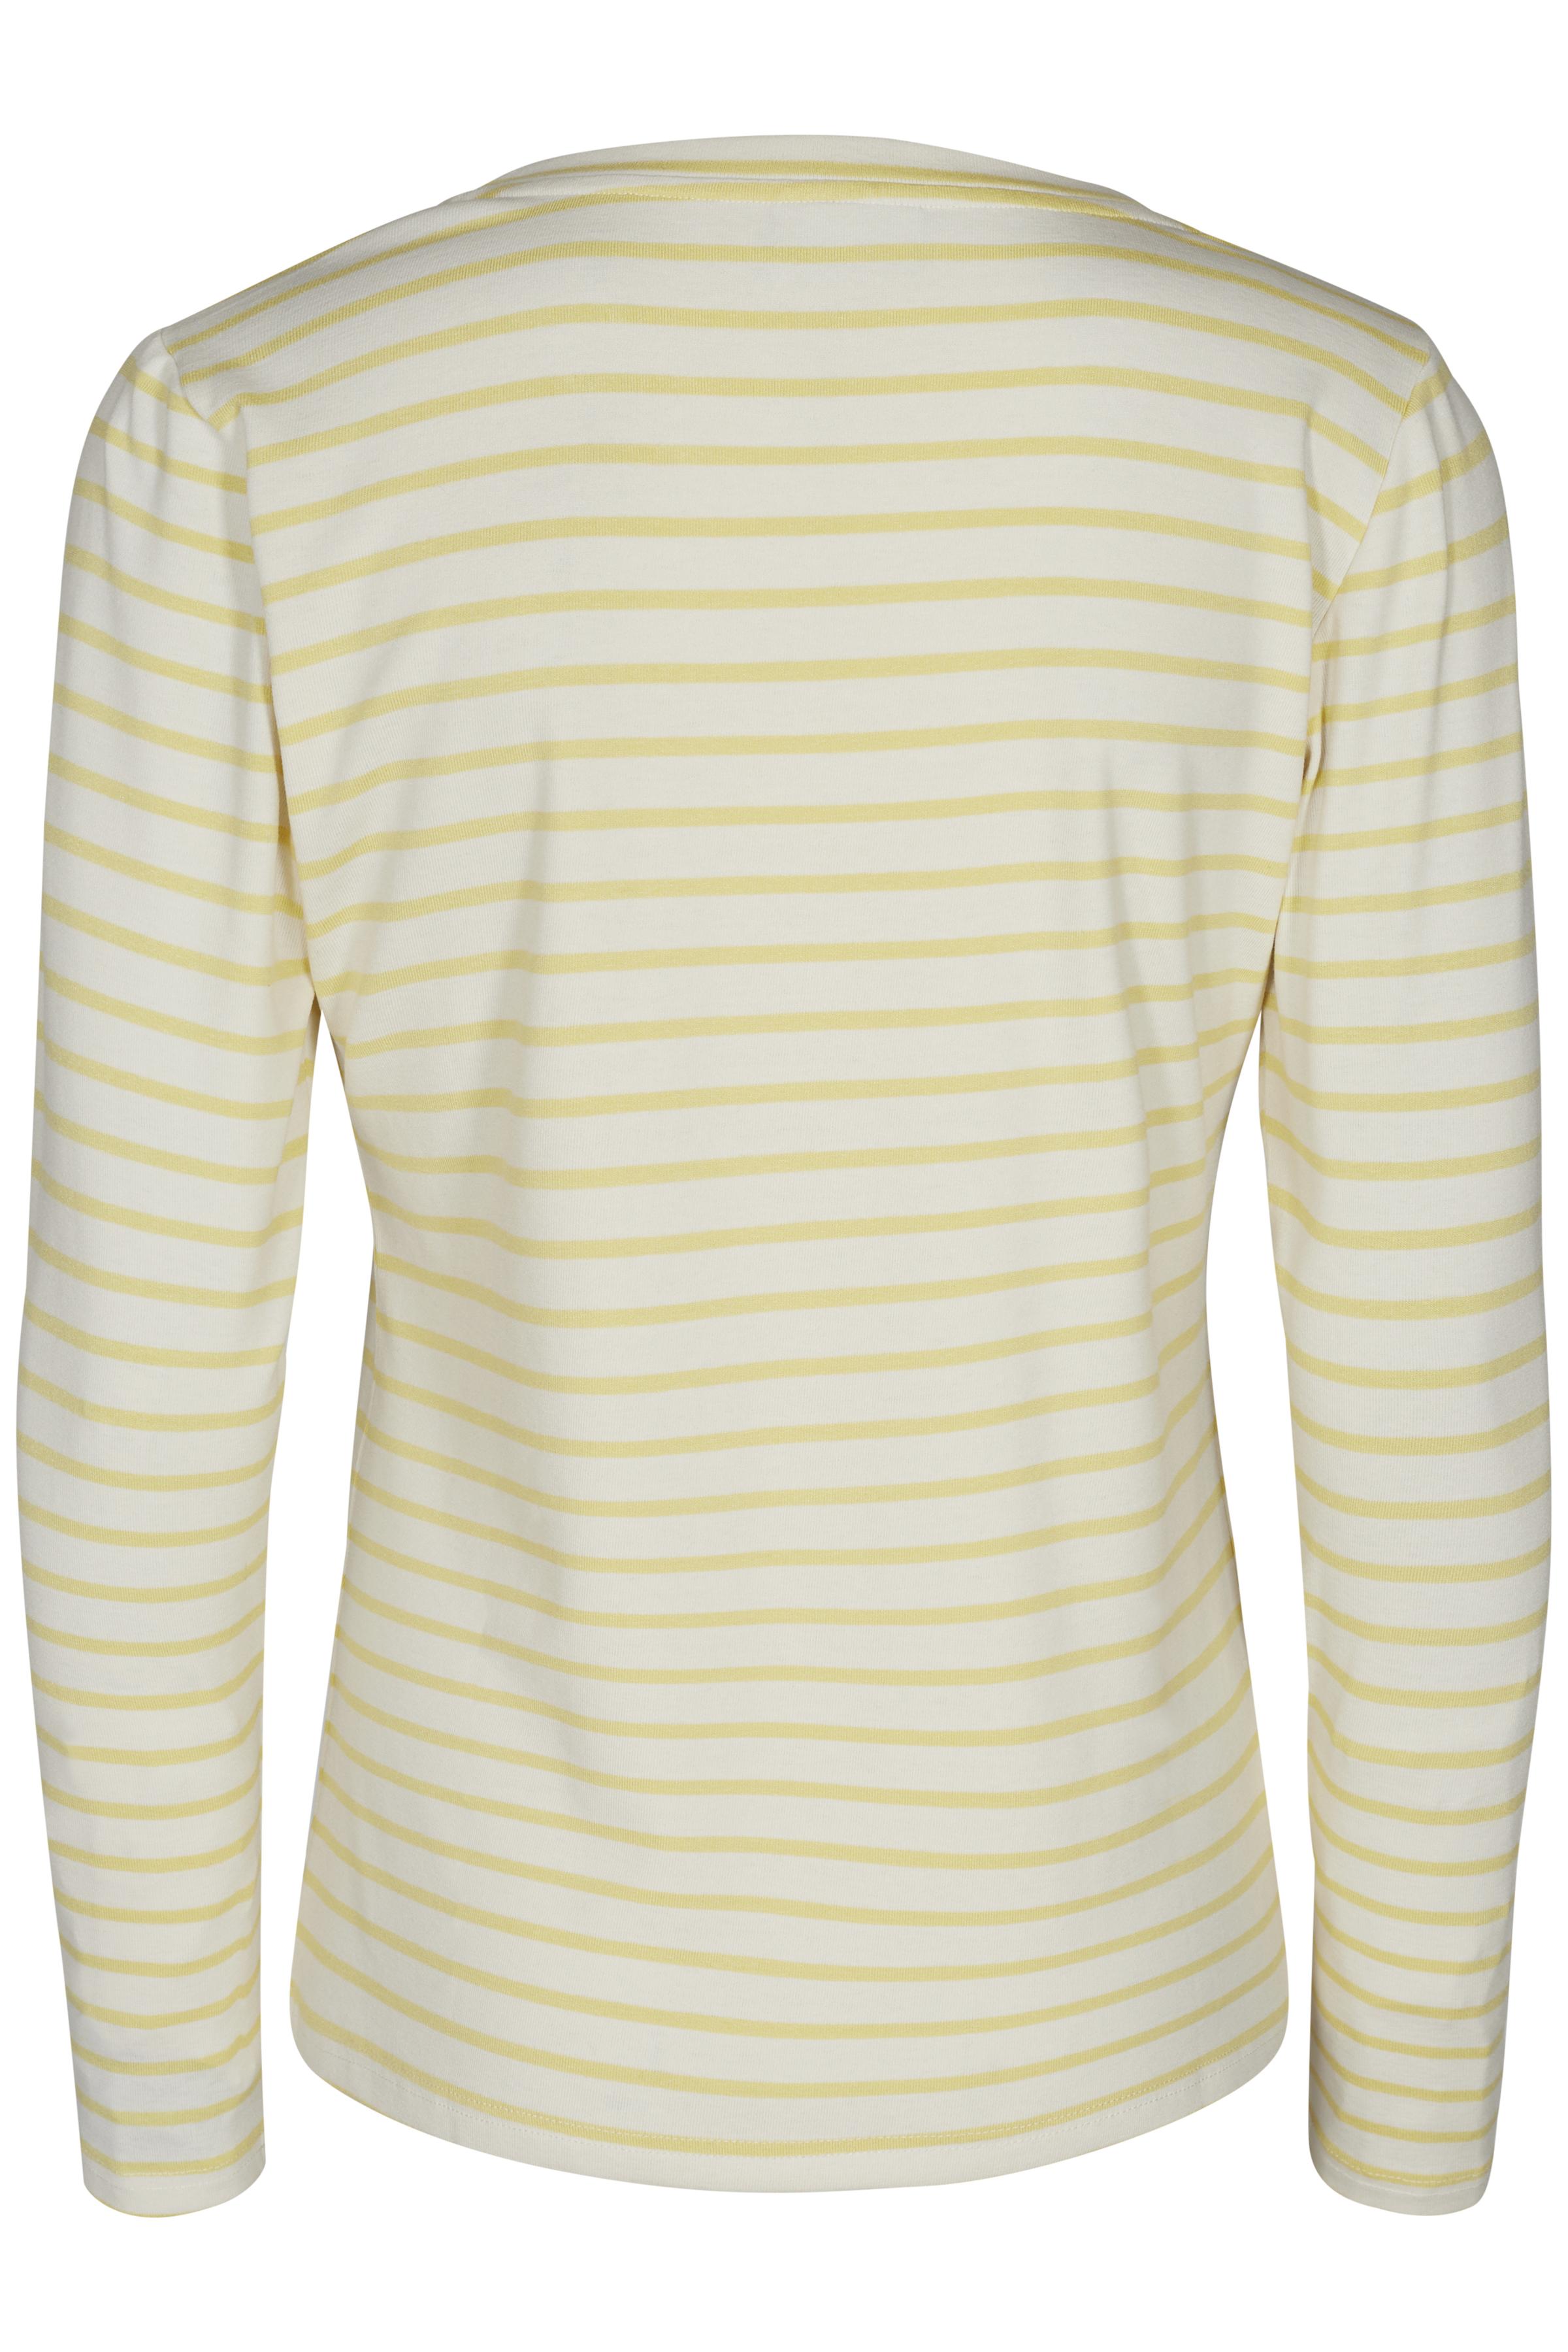 Gelb/wollweiss Langarm T-Shirt von Kaffe – Shoppen SieGelb/wollweiss Langarm T-Shirt ab Gr. XS-XXL hier